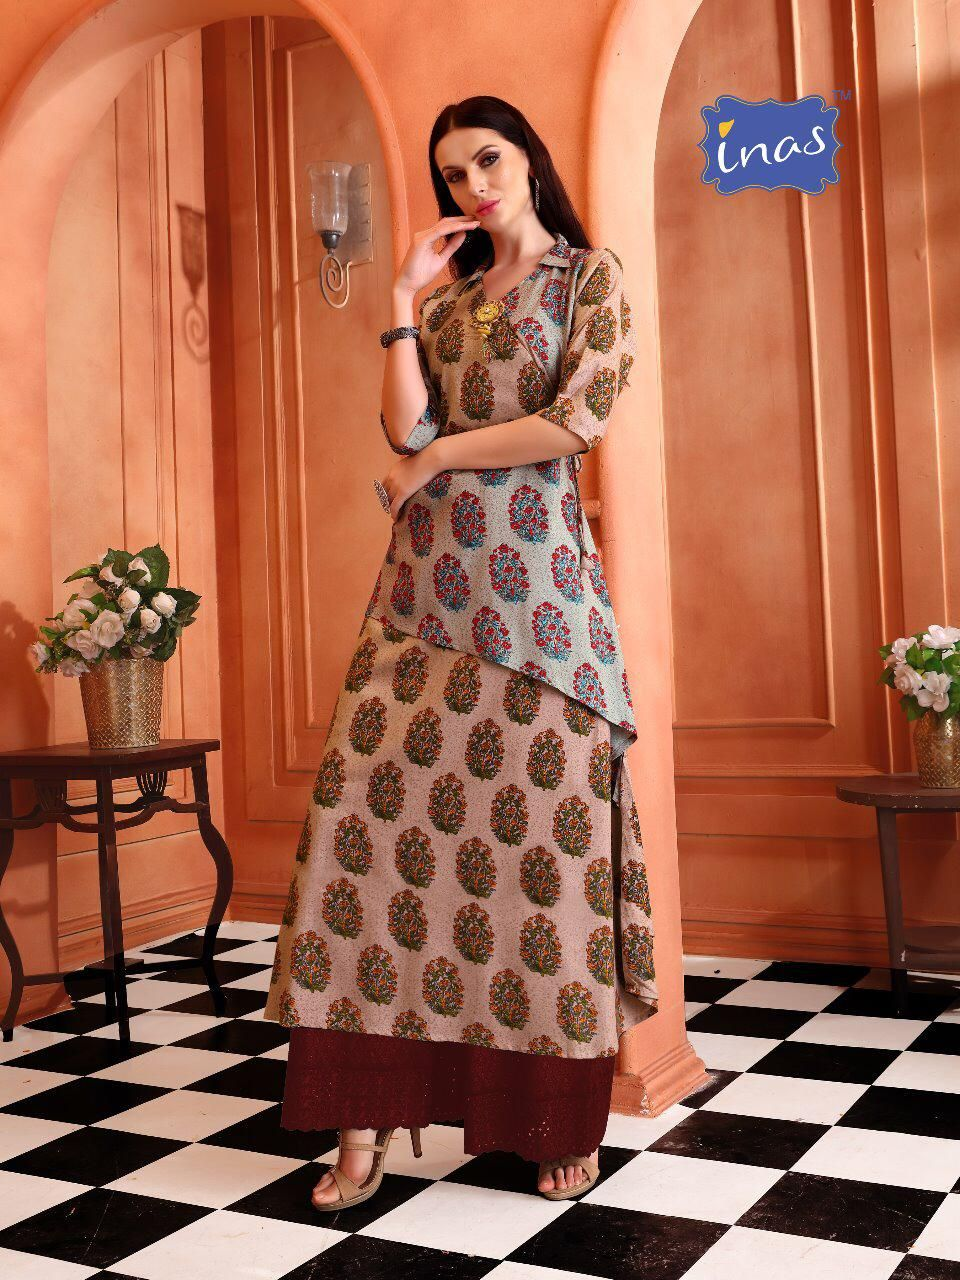 a074b257f0b  Kriyansh  textile inas Rayon Gown Style Party wear  trendy kurtis  wholesaler.  Buy online  2019 latest Designer Inas kurtis buy wholesale  rate at  catalog ...